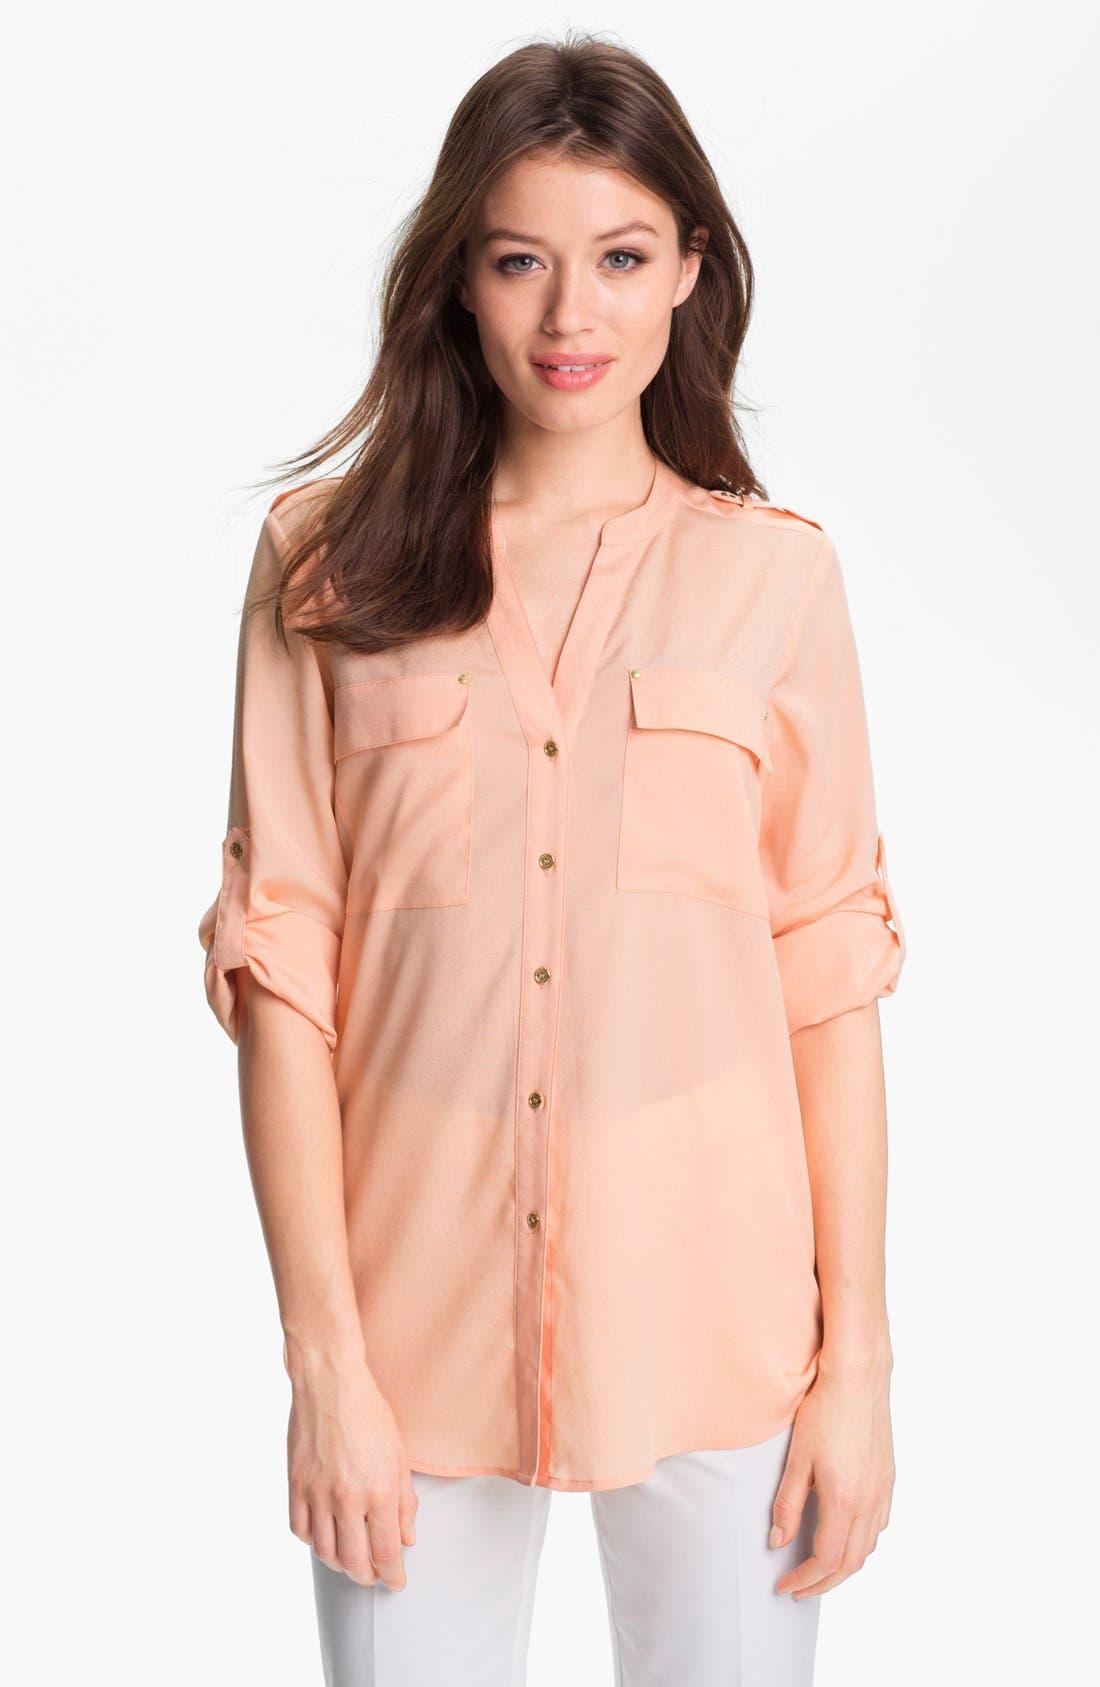 Alternate Image 1 Selected - Calvin Klein Roll Sleeve Blouse